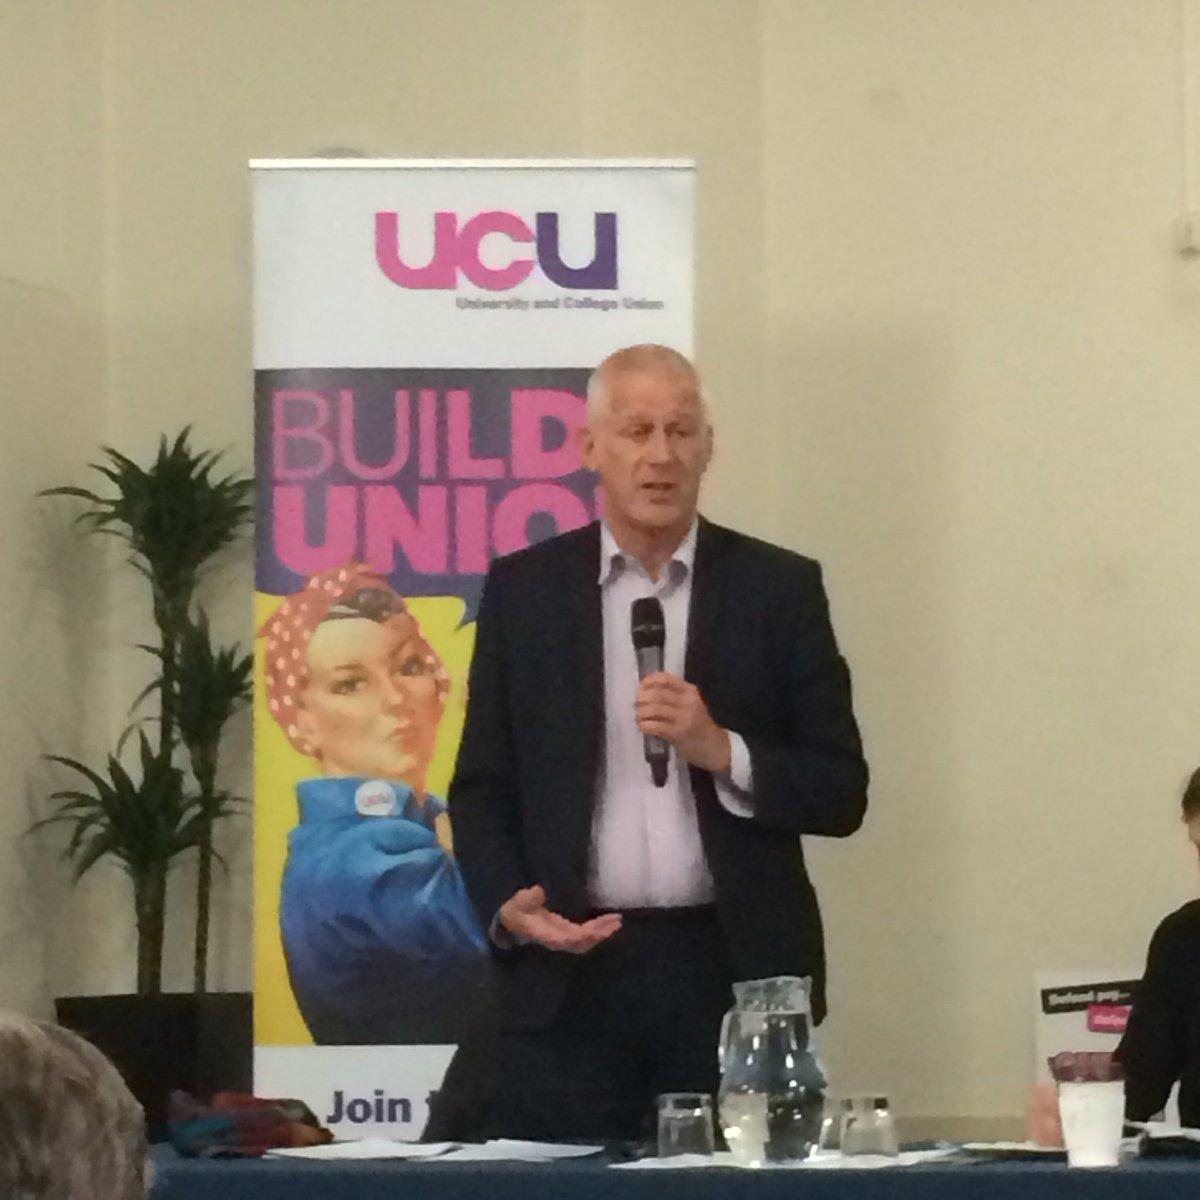 Now @GordonMarsden introduces the @ucu rally for the #FEStrike24Feb https://t.co/HyaDkvG72d